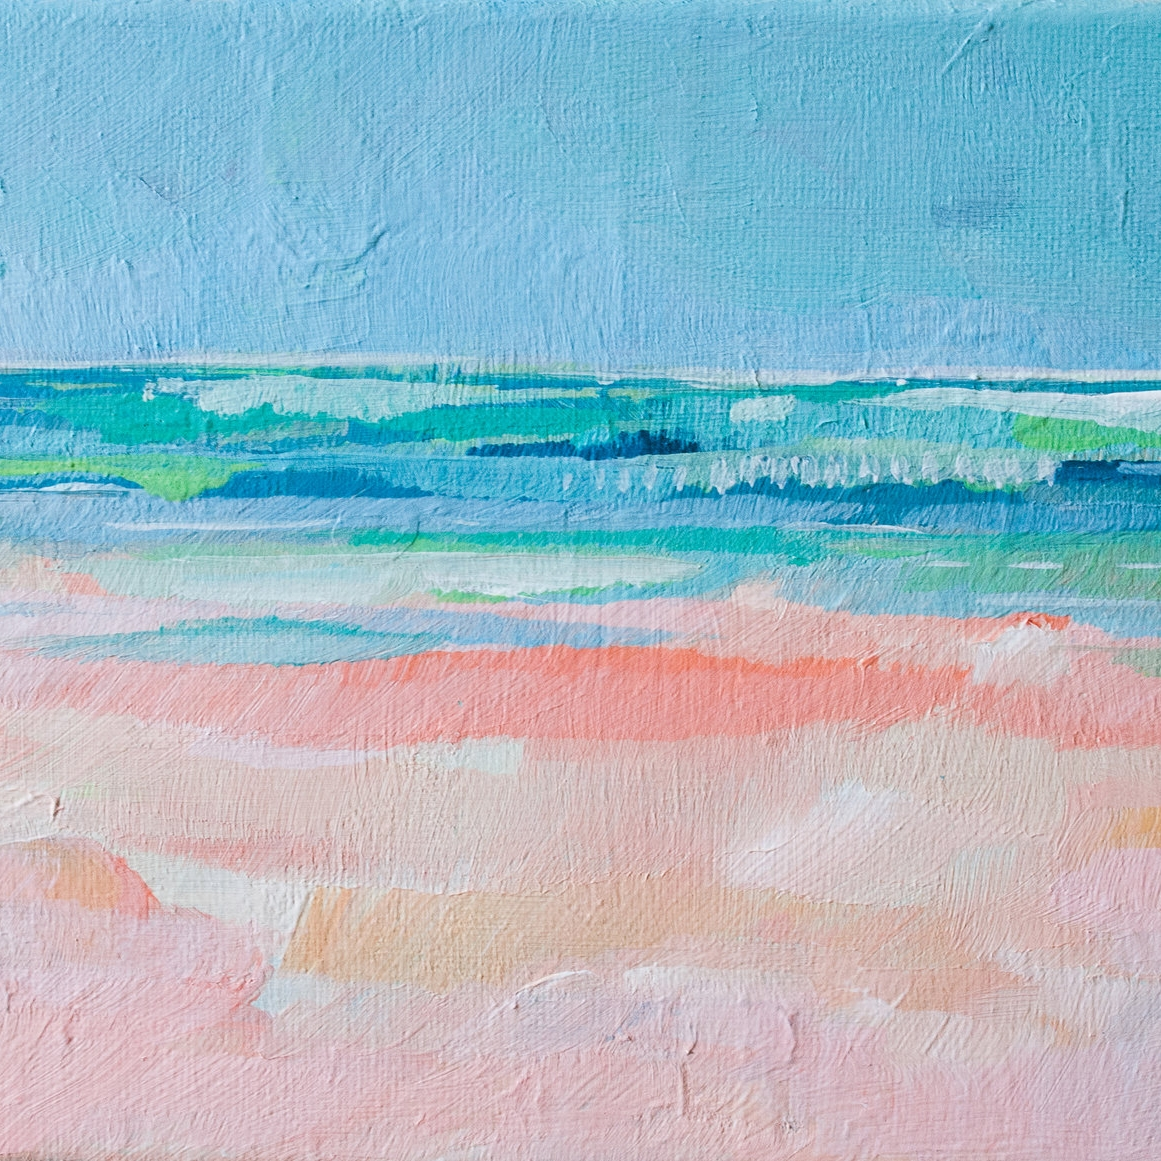 """Bermuda"" 8x10 print - Art by Megan"